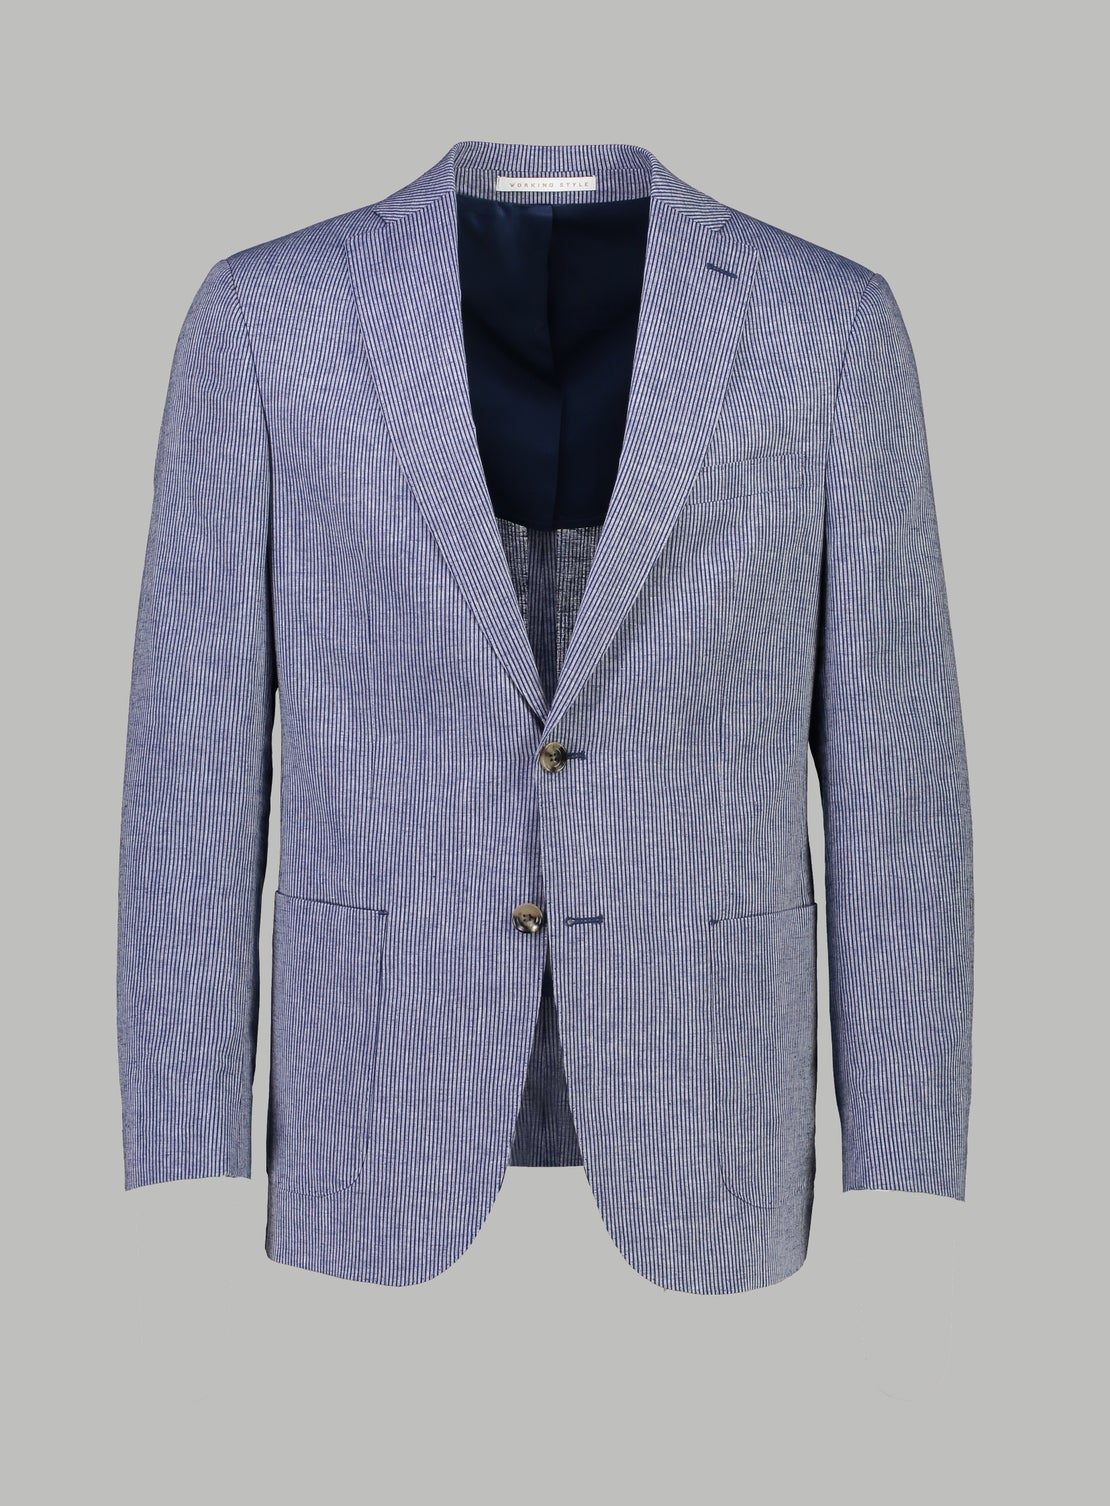 Blue White Pinstripe Jacket